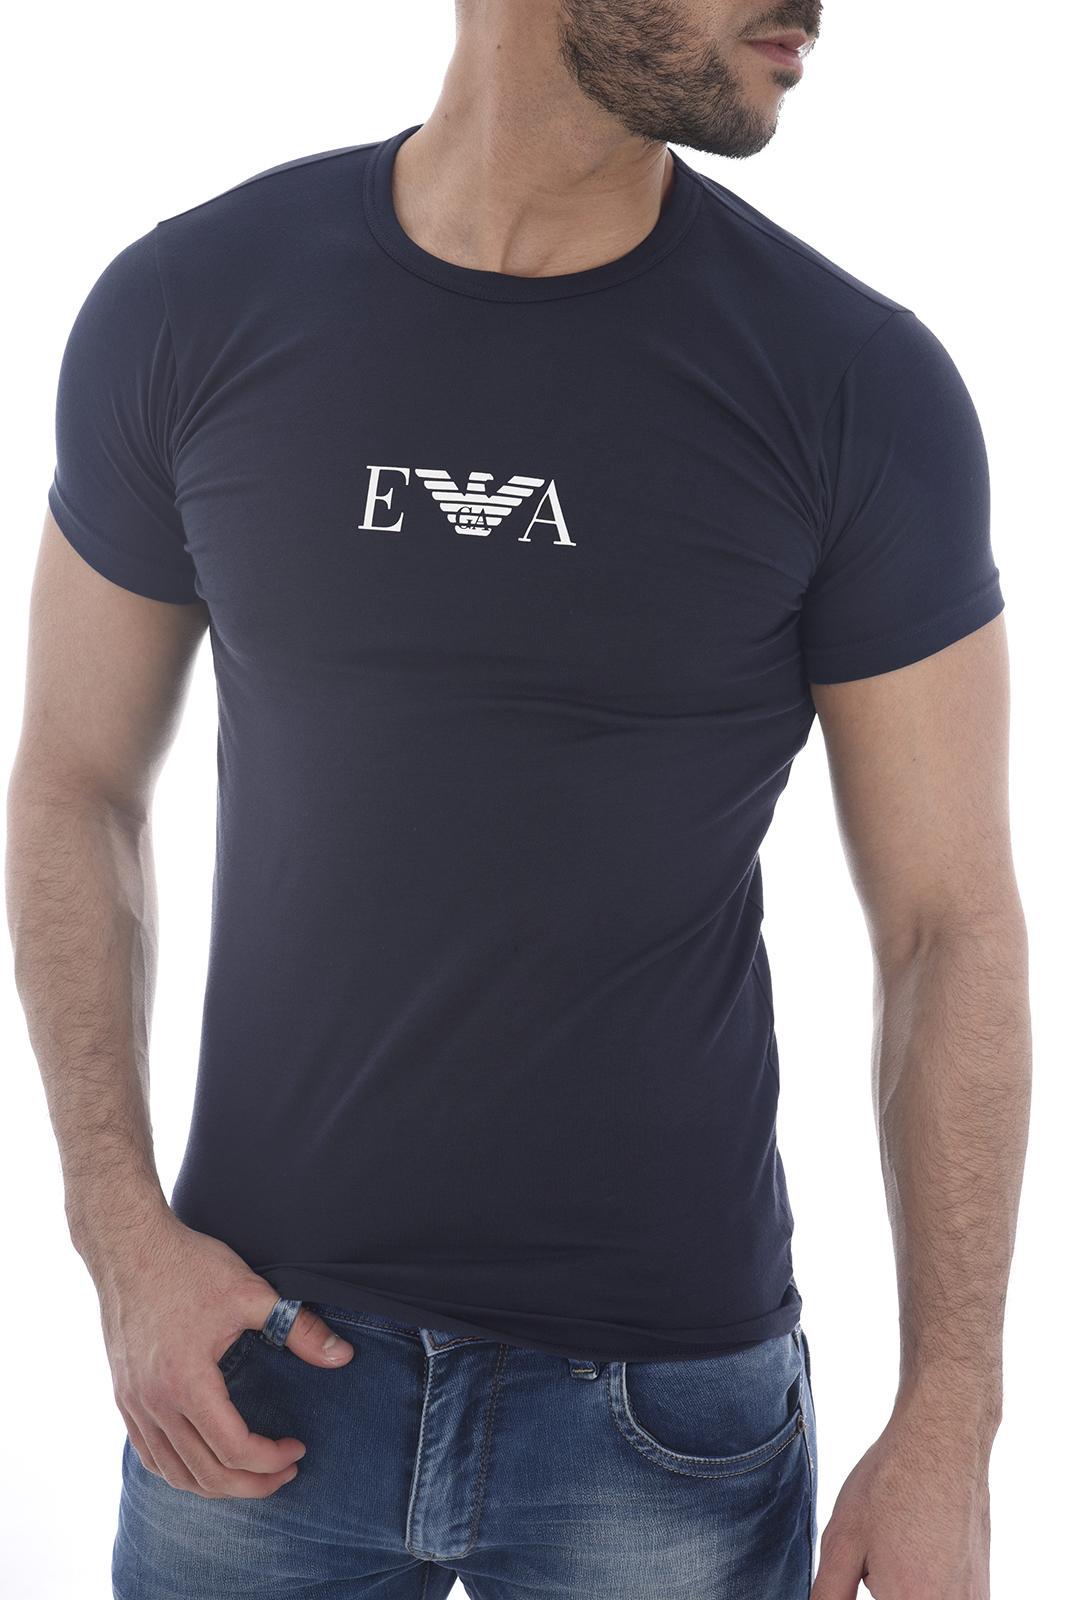 Tee-shirts  Emporio armani 111267 CC715 27435 MARINE/MARINE